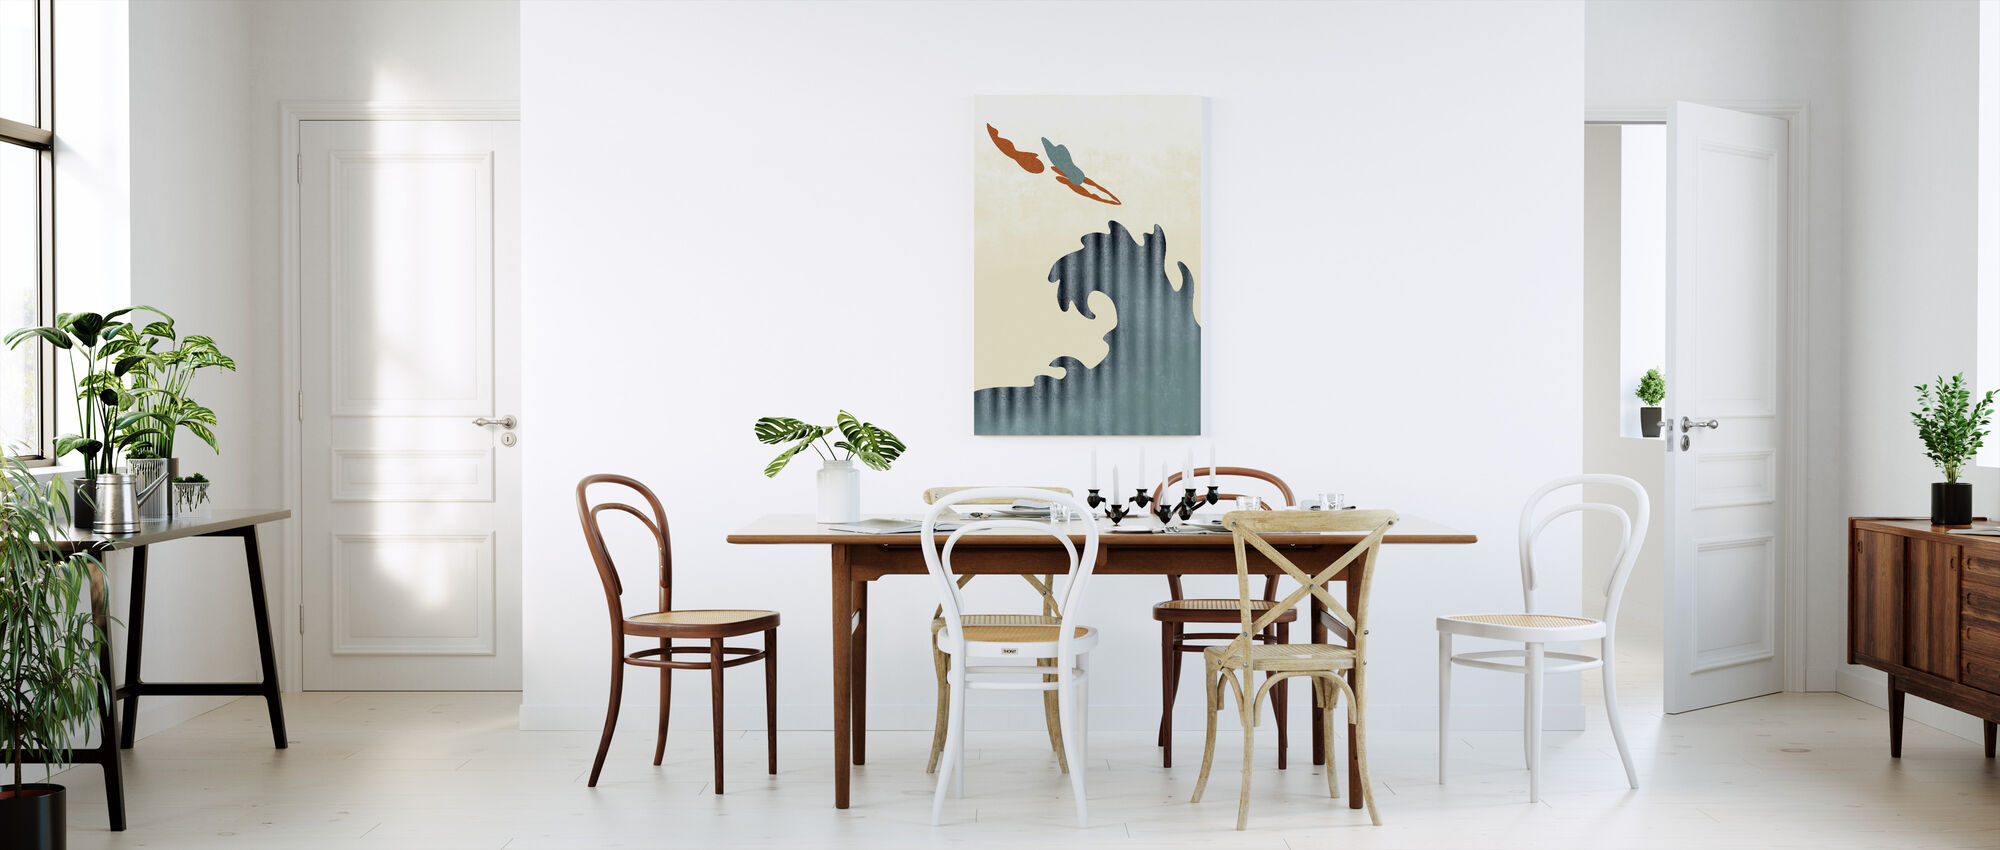 Holy Diver - Canvas print - Kitchen